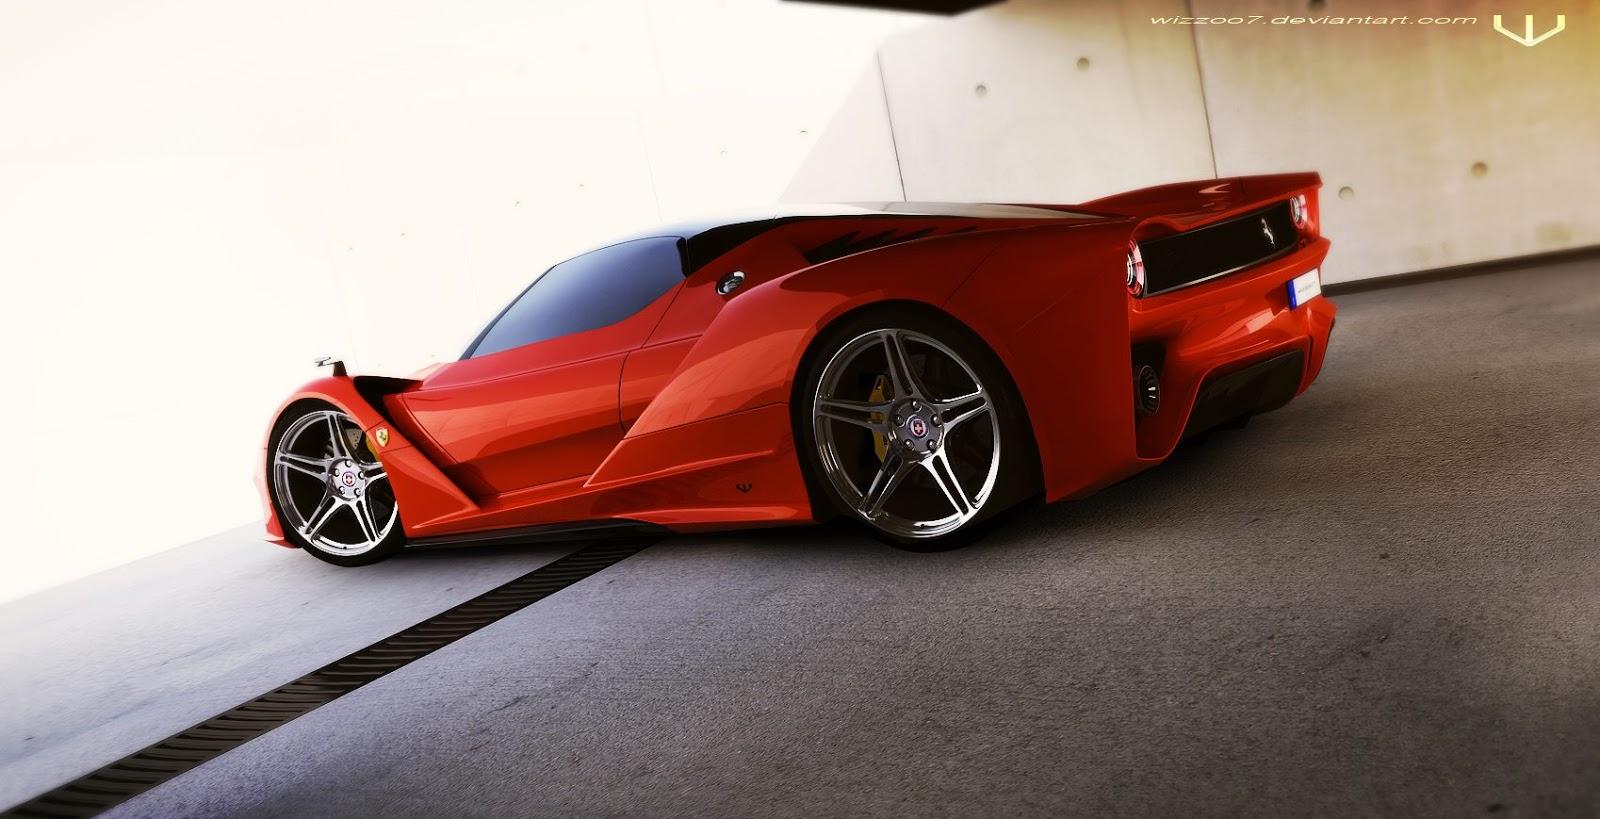 Cars hd wallpapers ferrari f70 concept best hd picture ferrari f70 concept best hd picture vanachro Choice Image